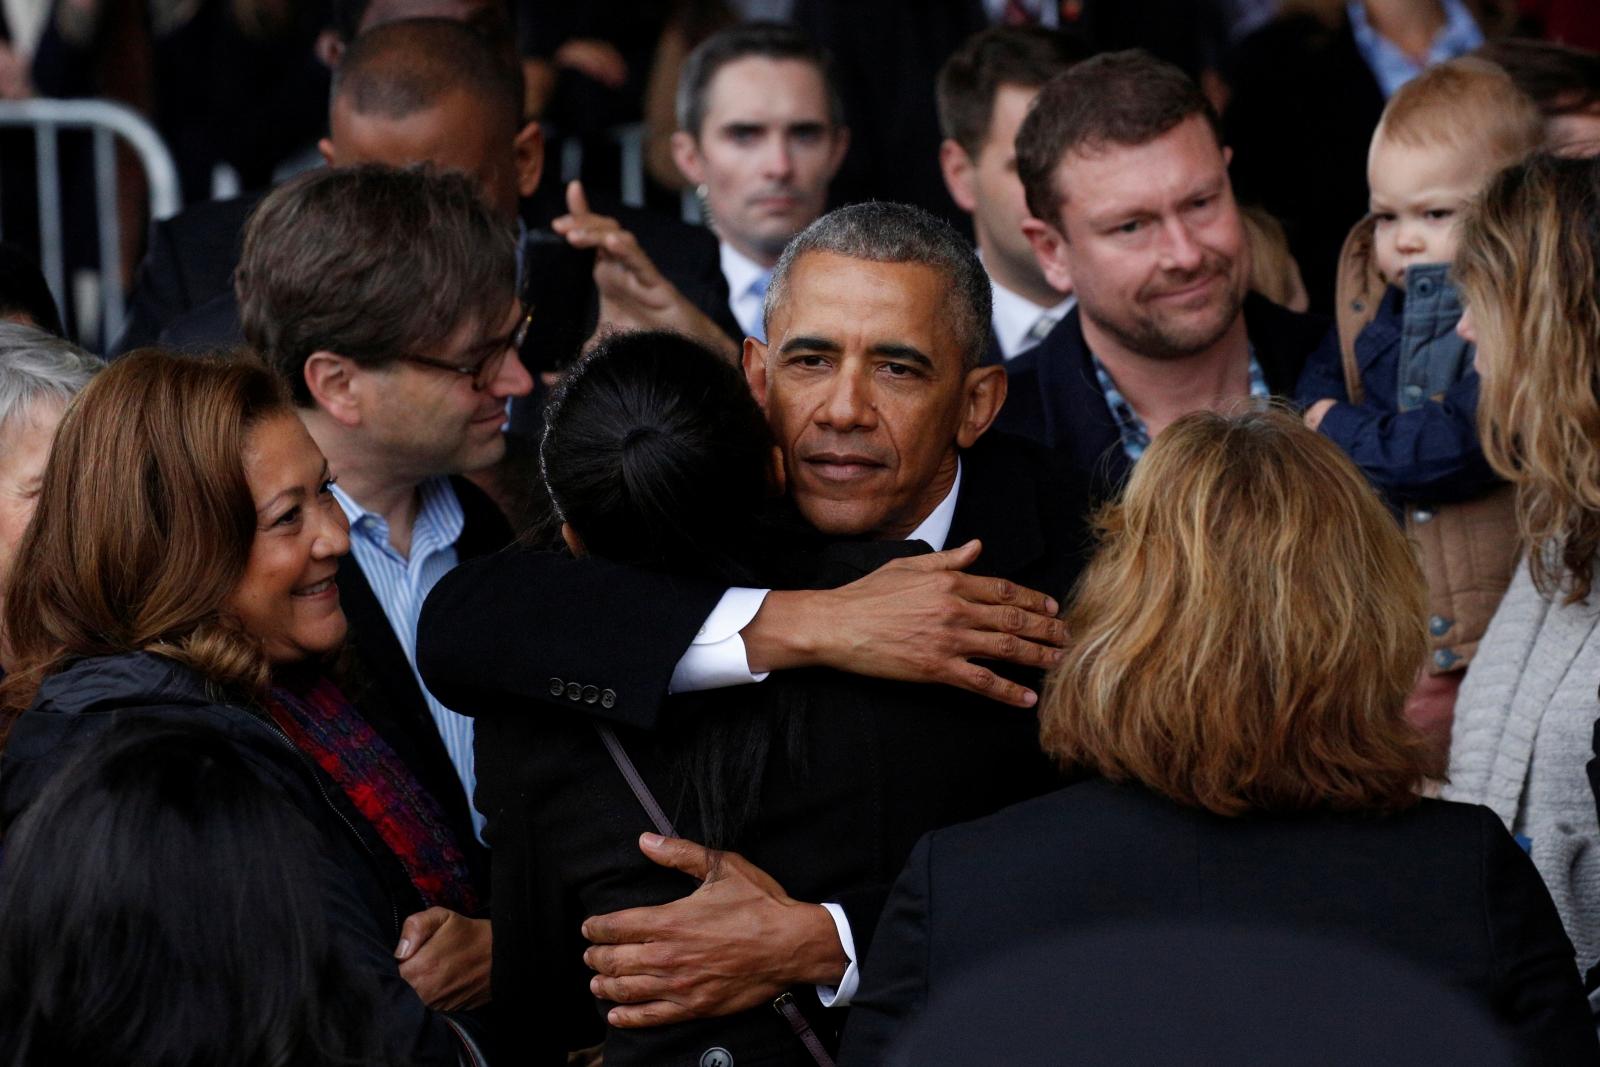 USA-TRUMP/INAUGURATION-OBAMA